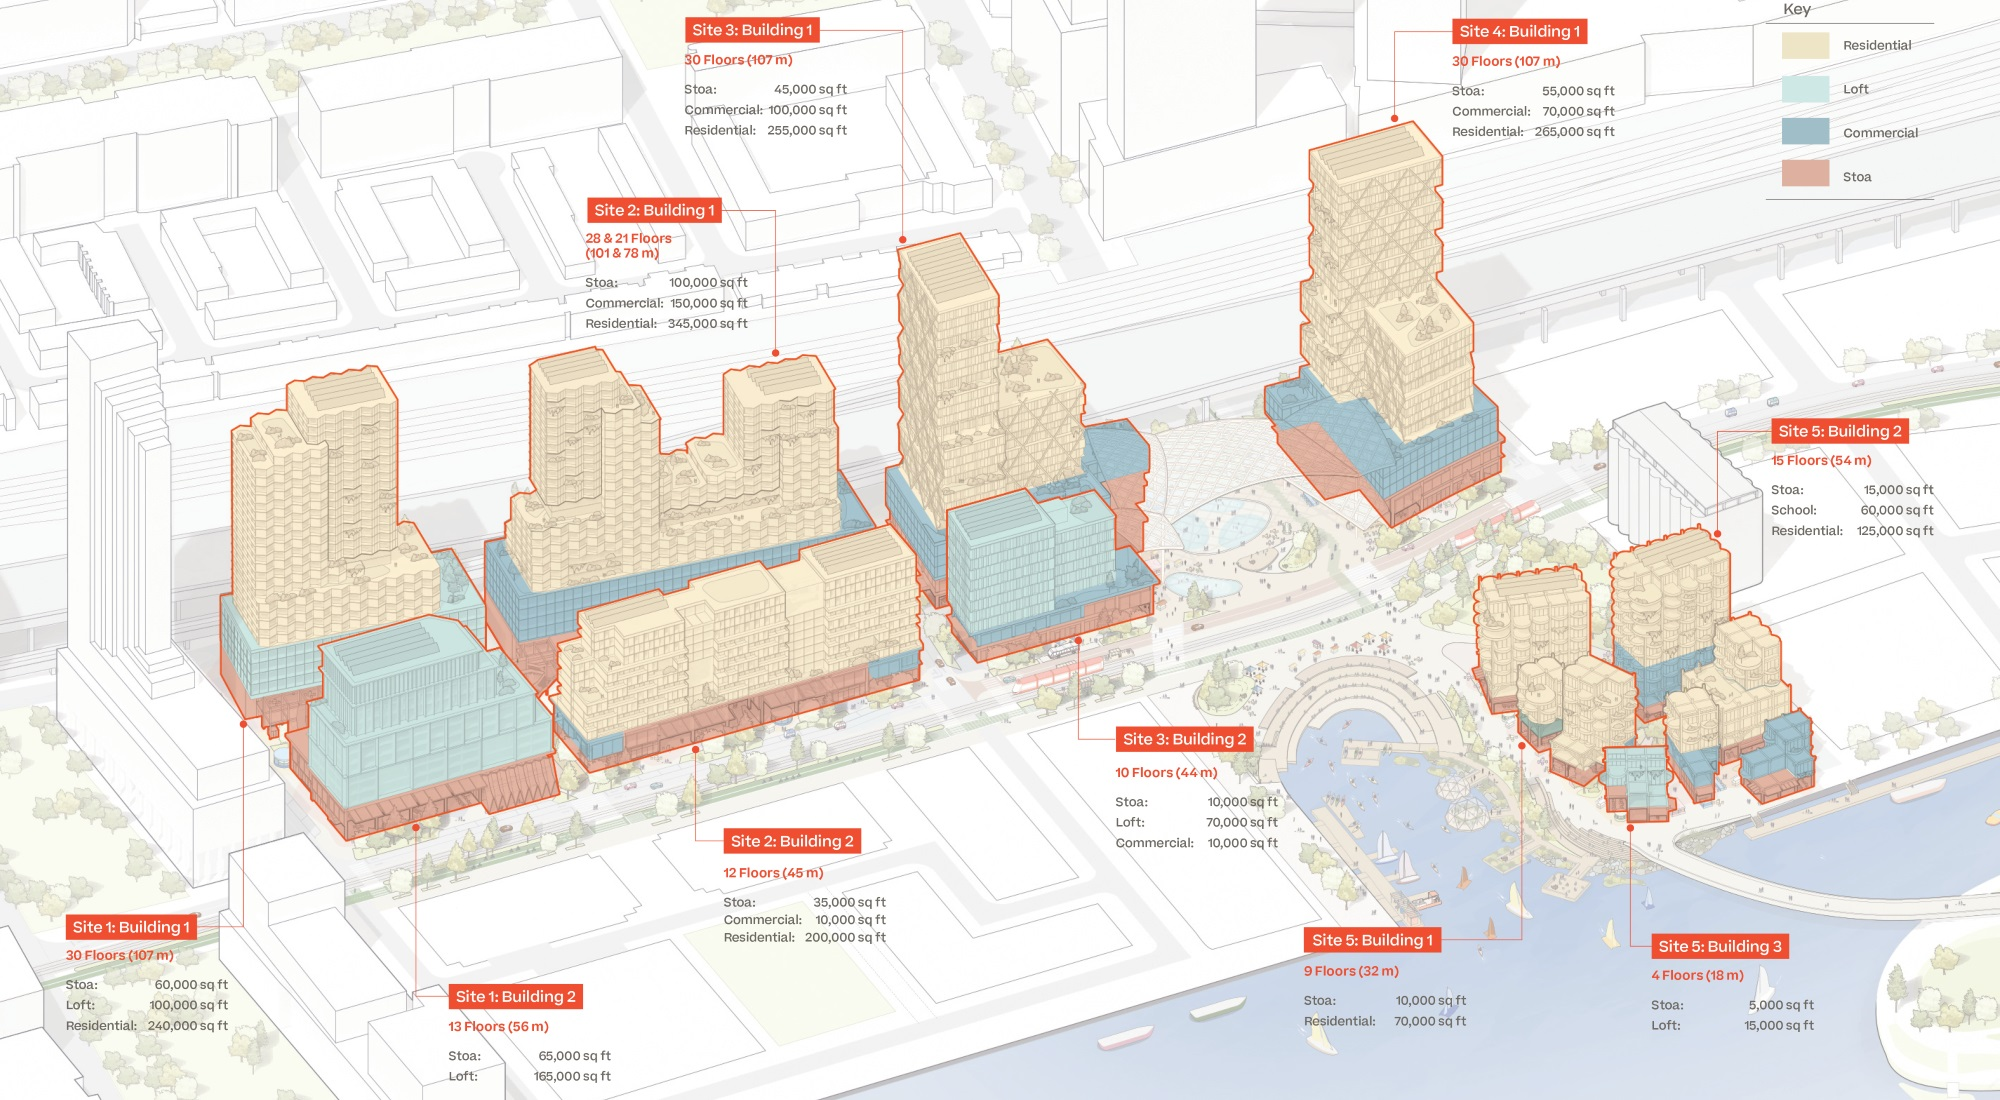 Alphabet S Sidewalk Labs Cancels Toronto Smart City Project Over Unprecedented Economic Uncertainty Venturebeat